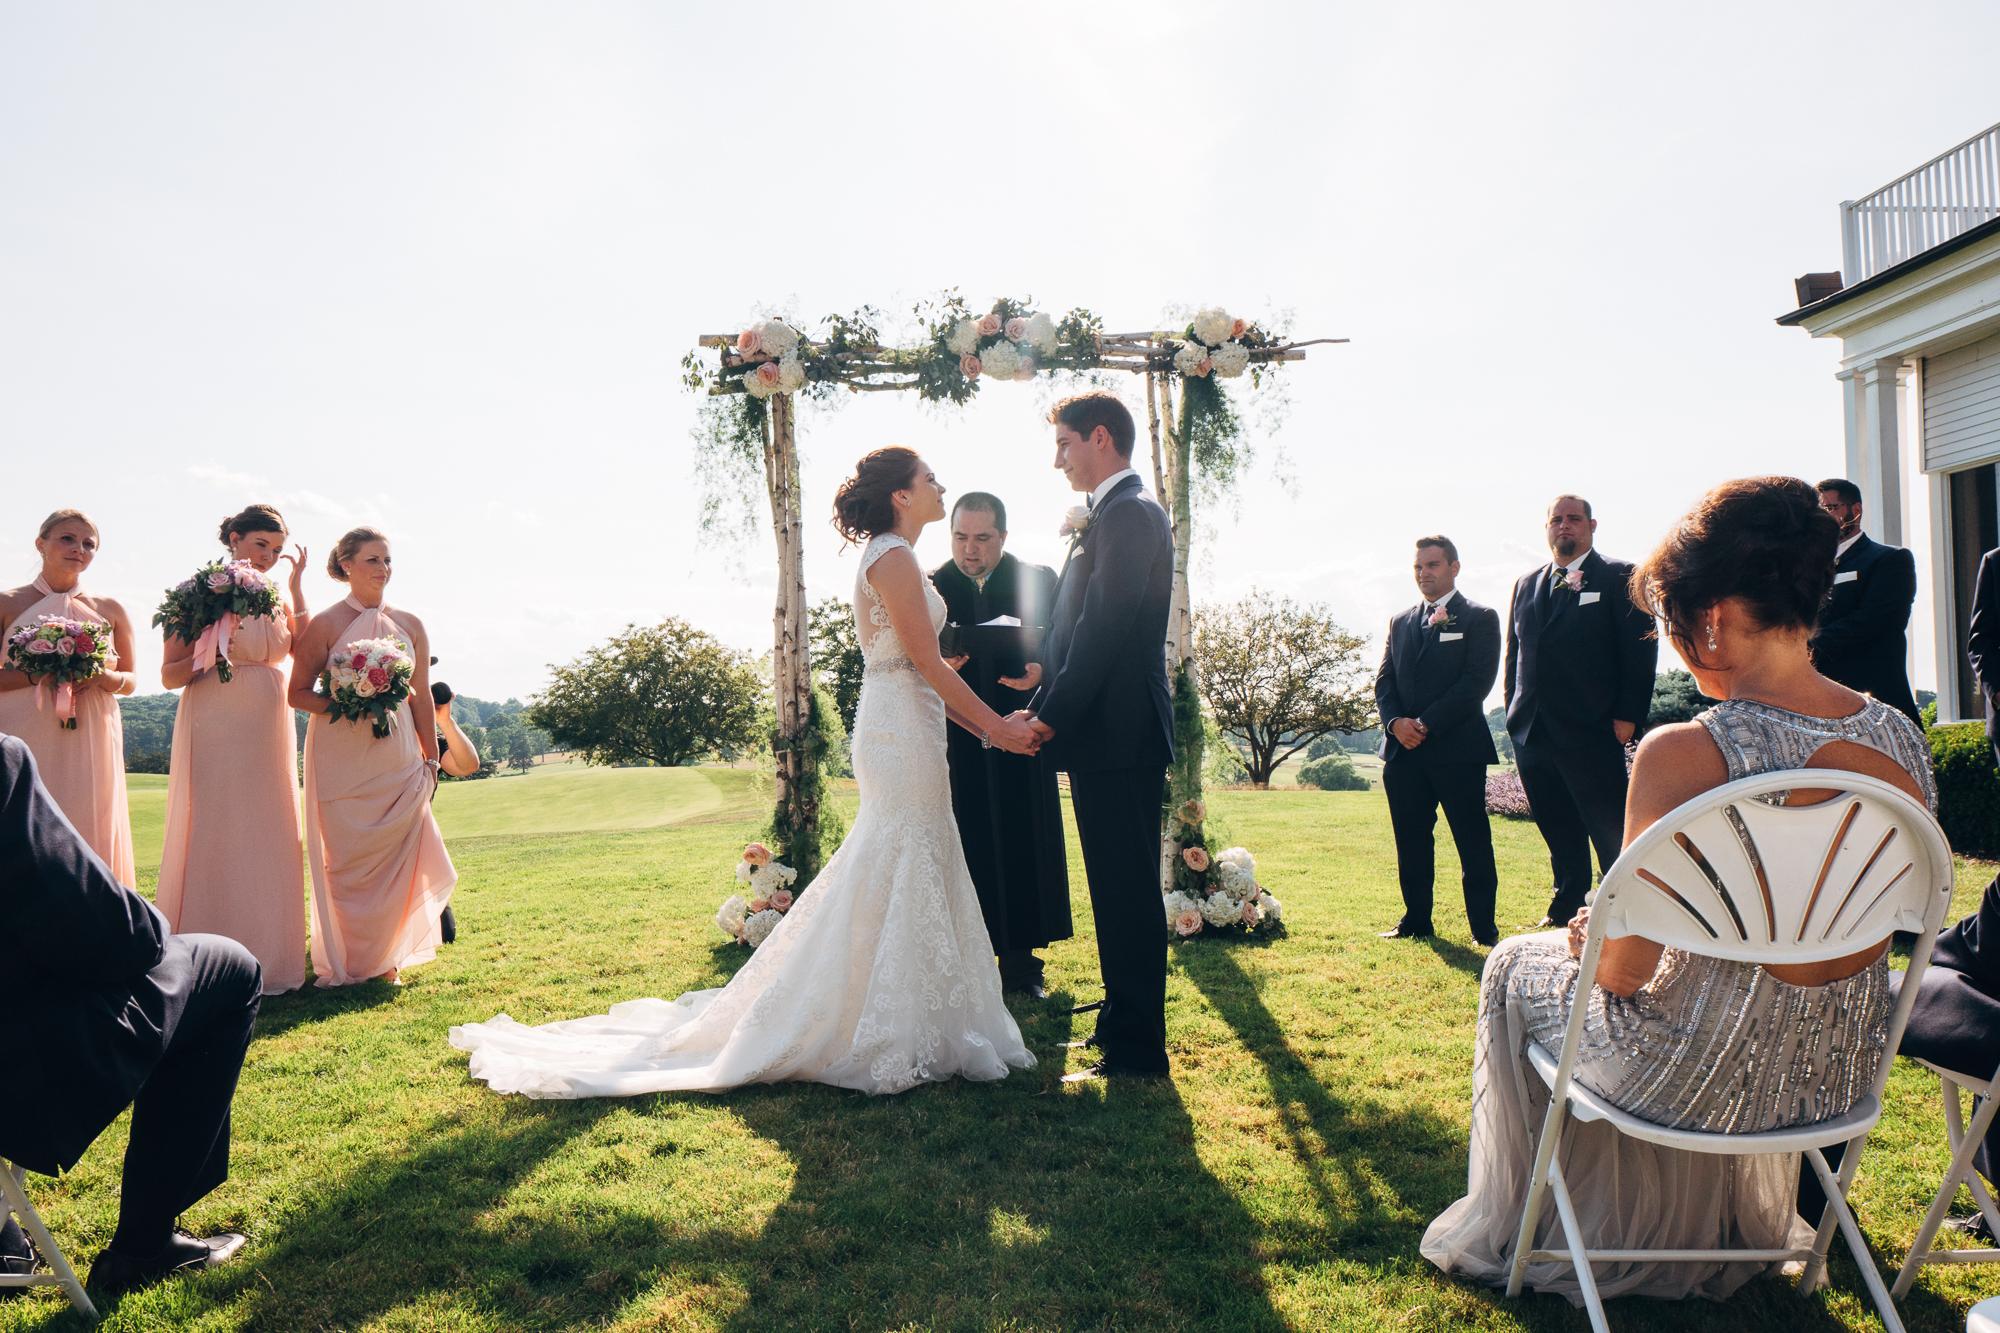 scranton-wedding-photography-zak-zavada-2016.06-rebeccaIan-0469.jpg